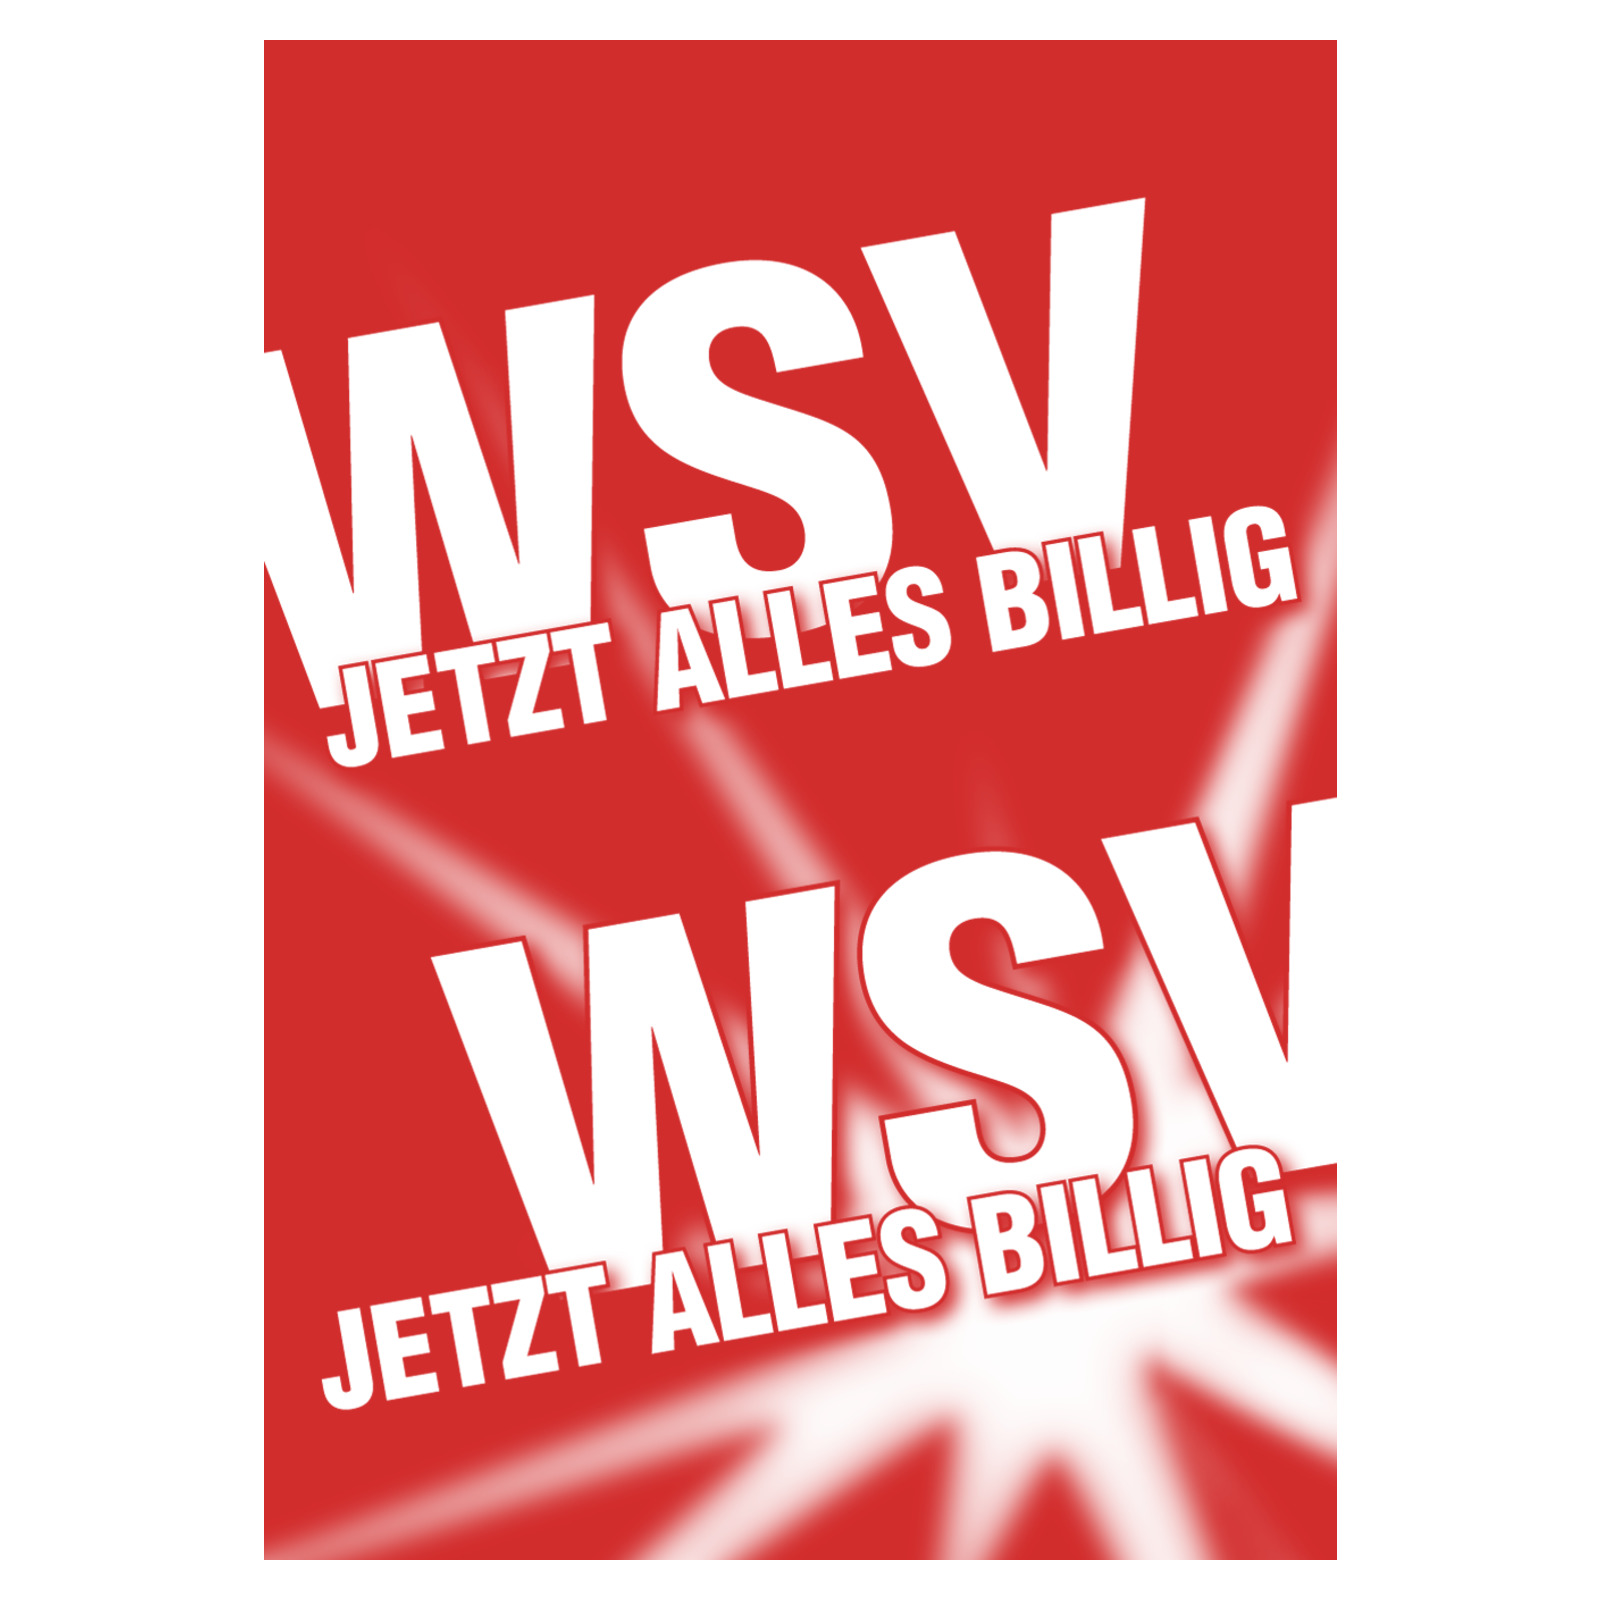 Plakat DIN A1 WSV Jetzt alles billig - Restposten Plakate Plakate ...